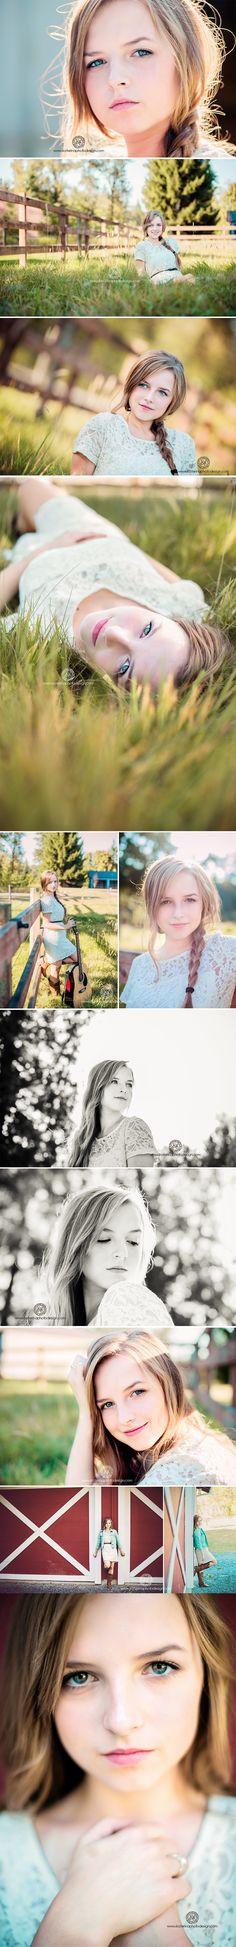 Country Senior Photo Sеssion || Fine Art Seattle Senior Photographer » Katerina Fortygin Photography and Design